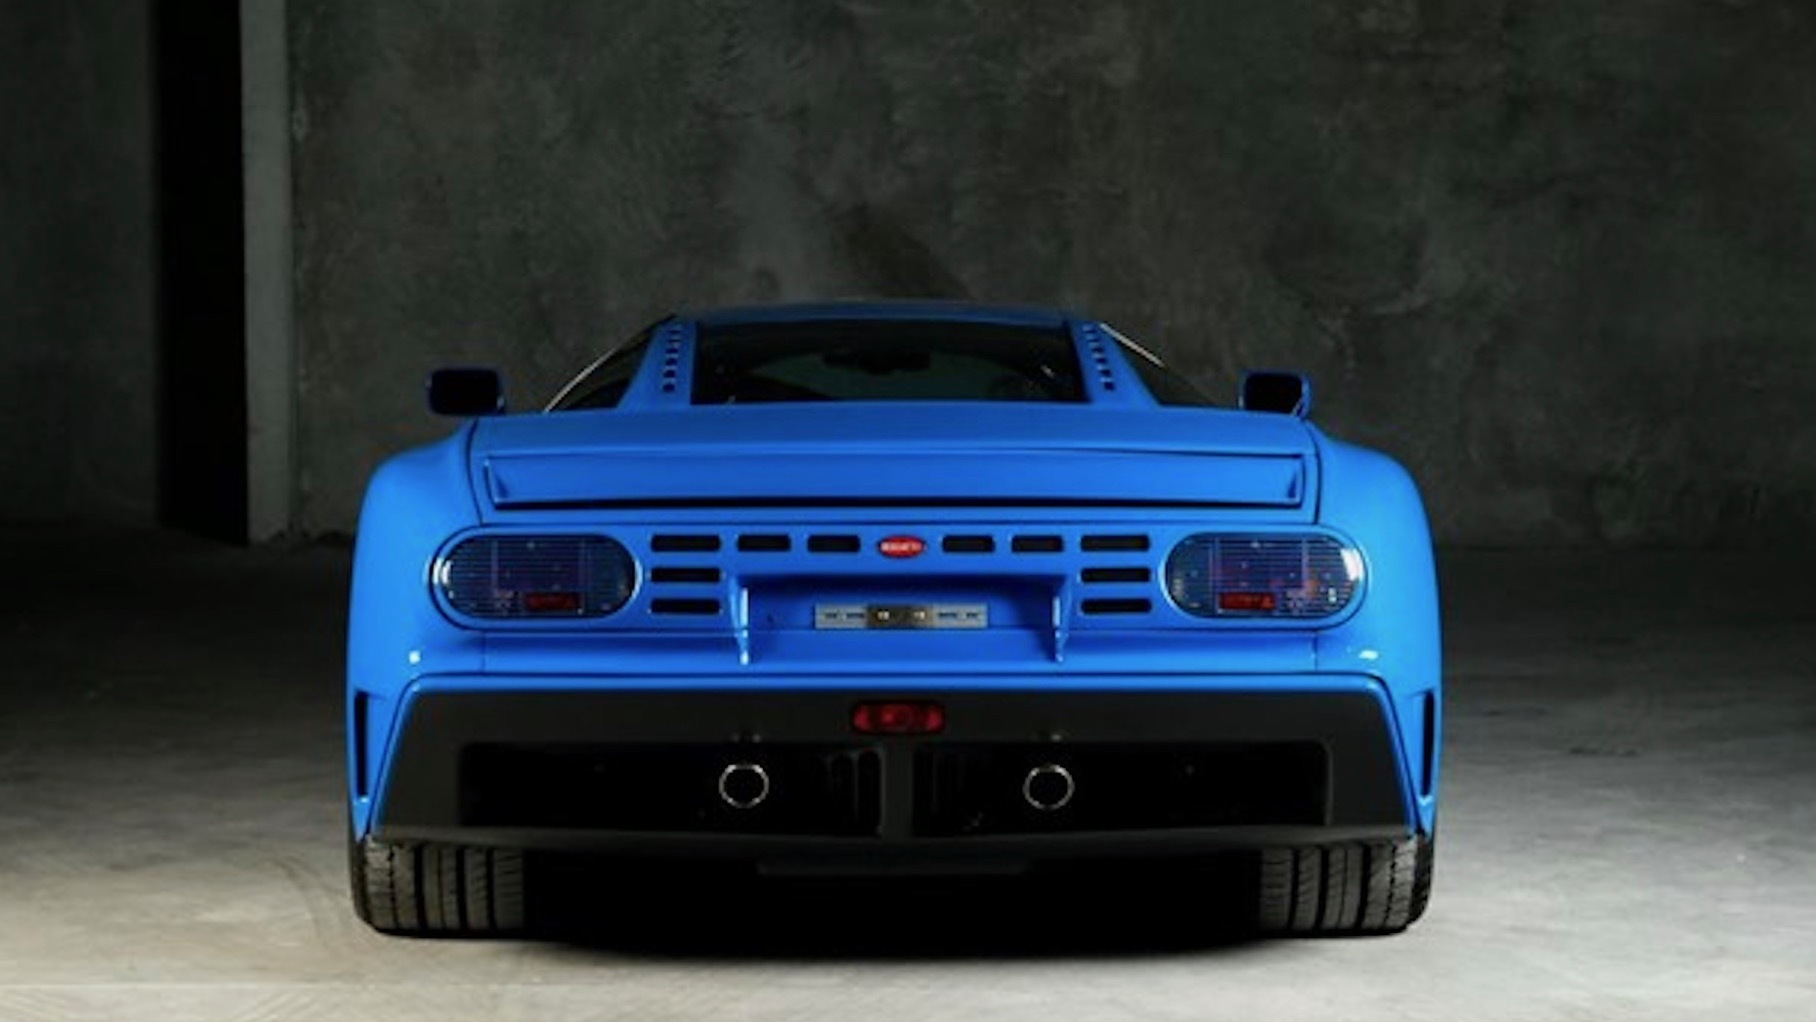 1994 Bugatti EB 110 GT prototype (photo via DuPont Registry)